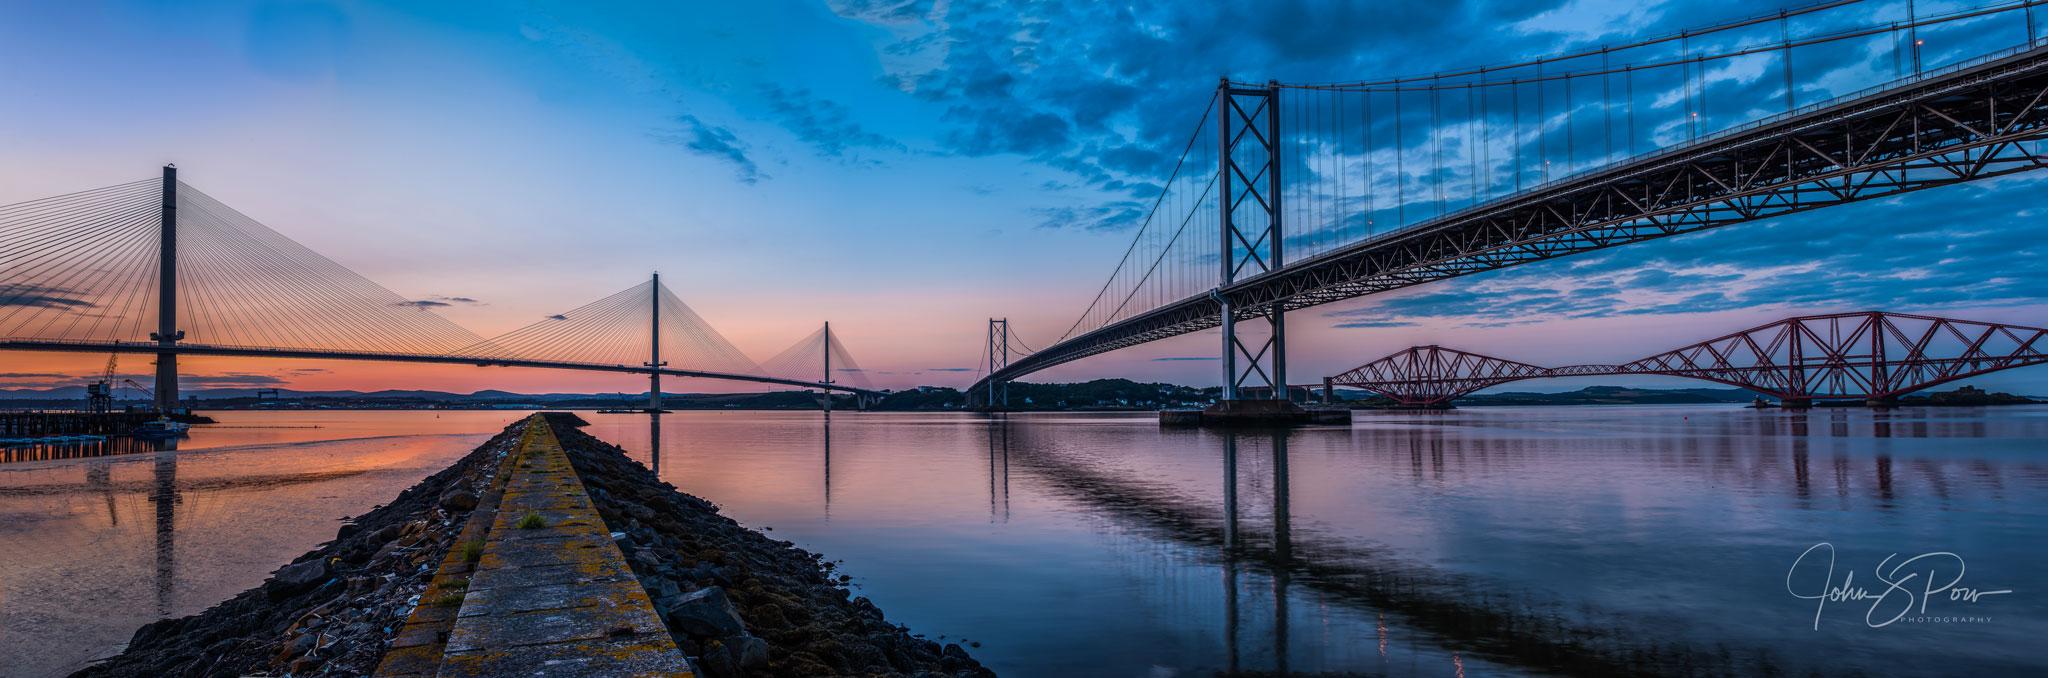 Three Bridges at Sunset.